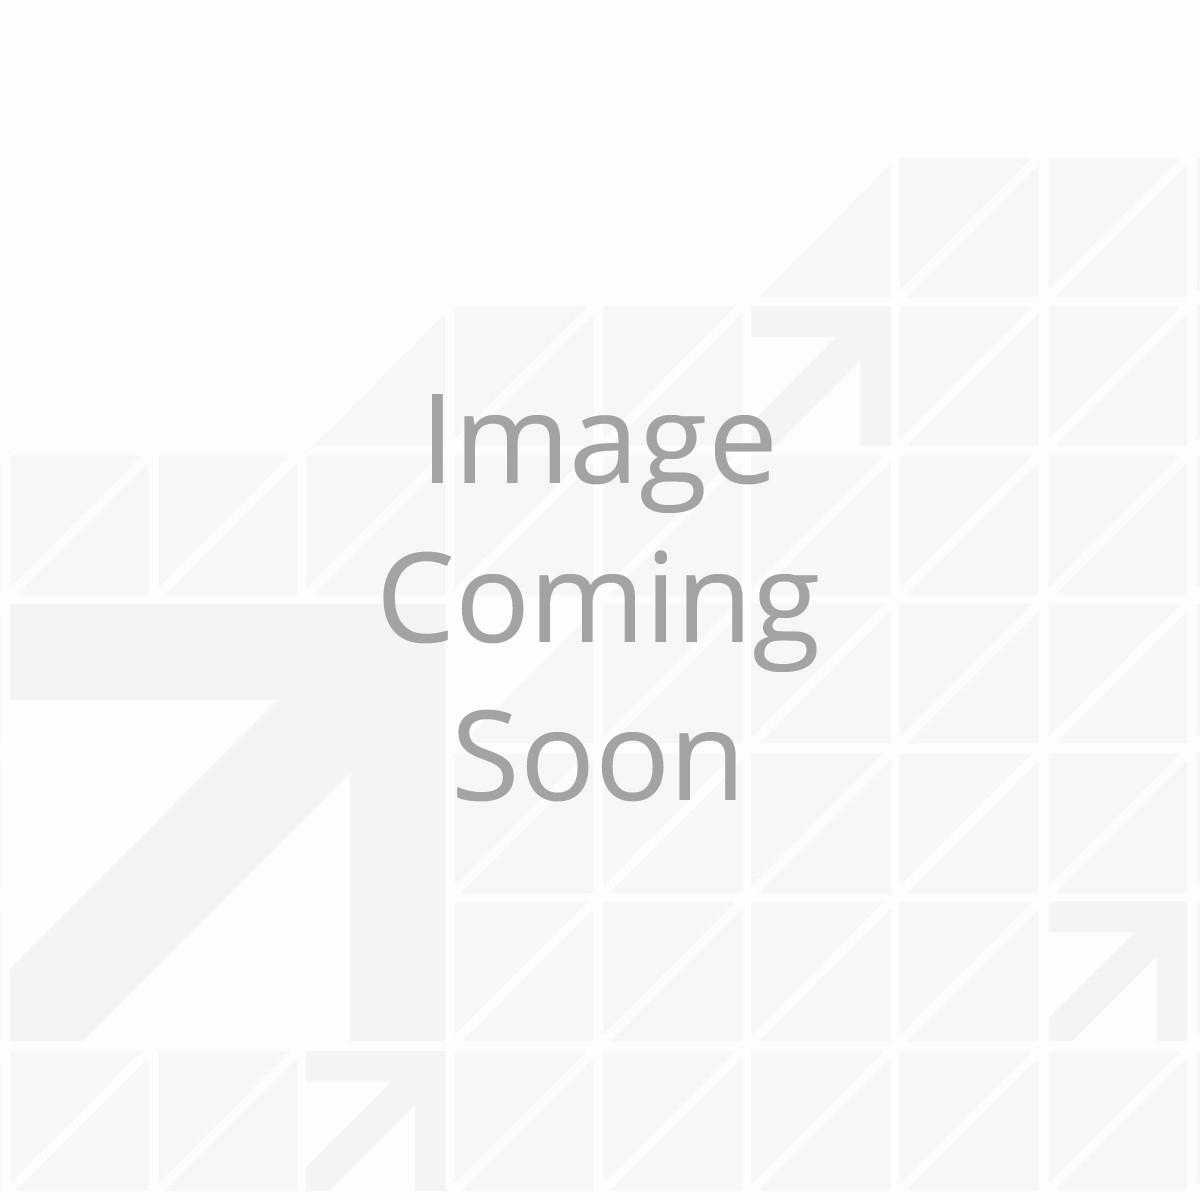 SB-080; Stabilizing Bar for Dodge 2008 Ram